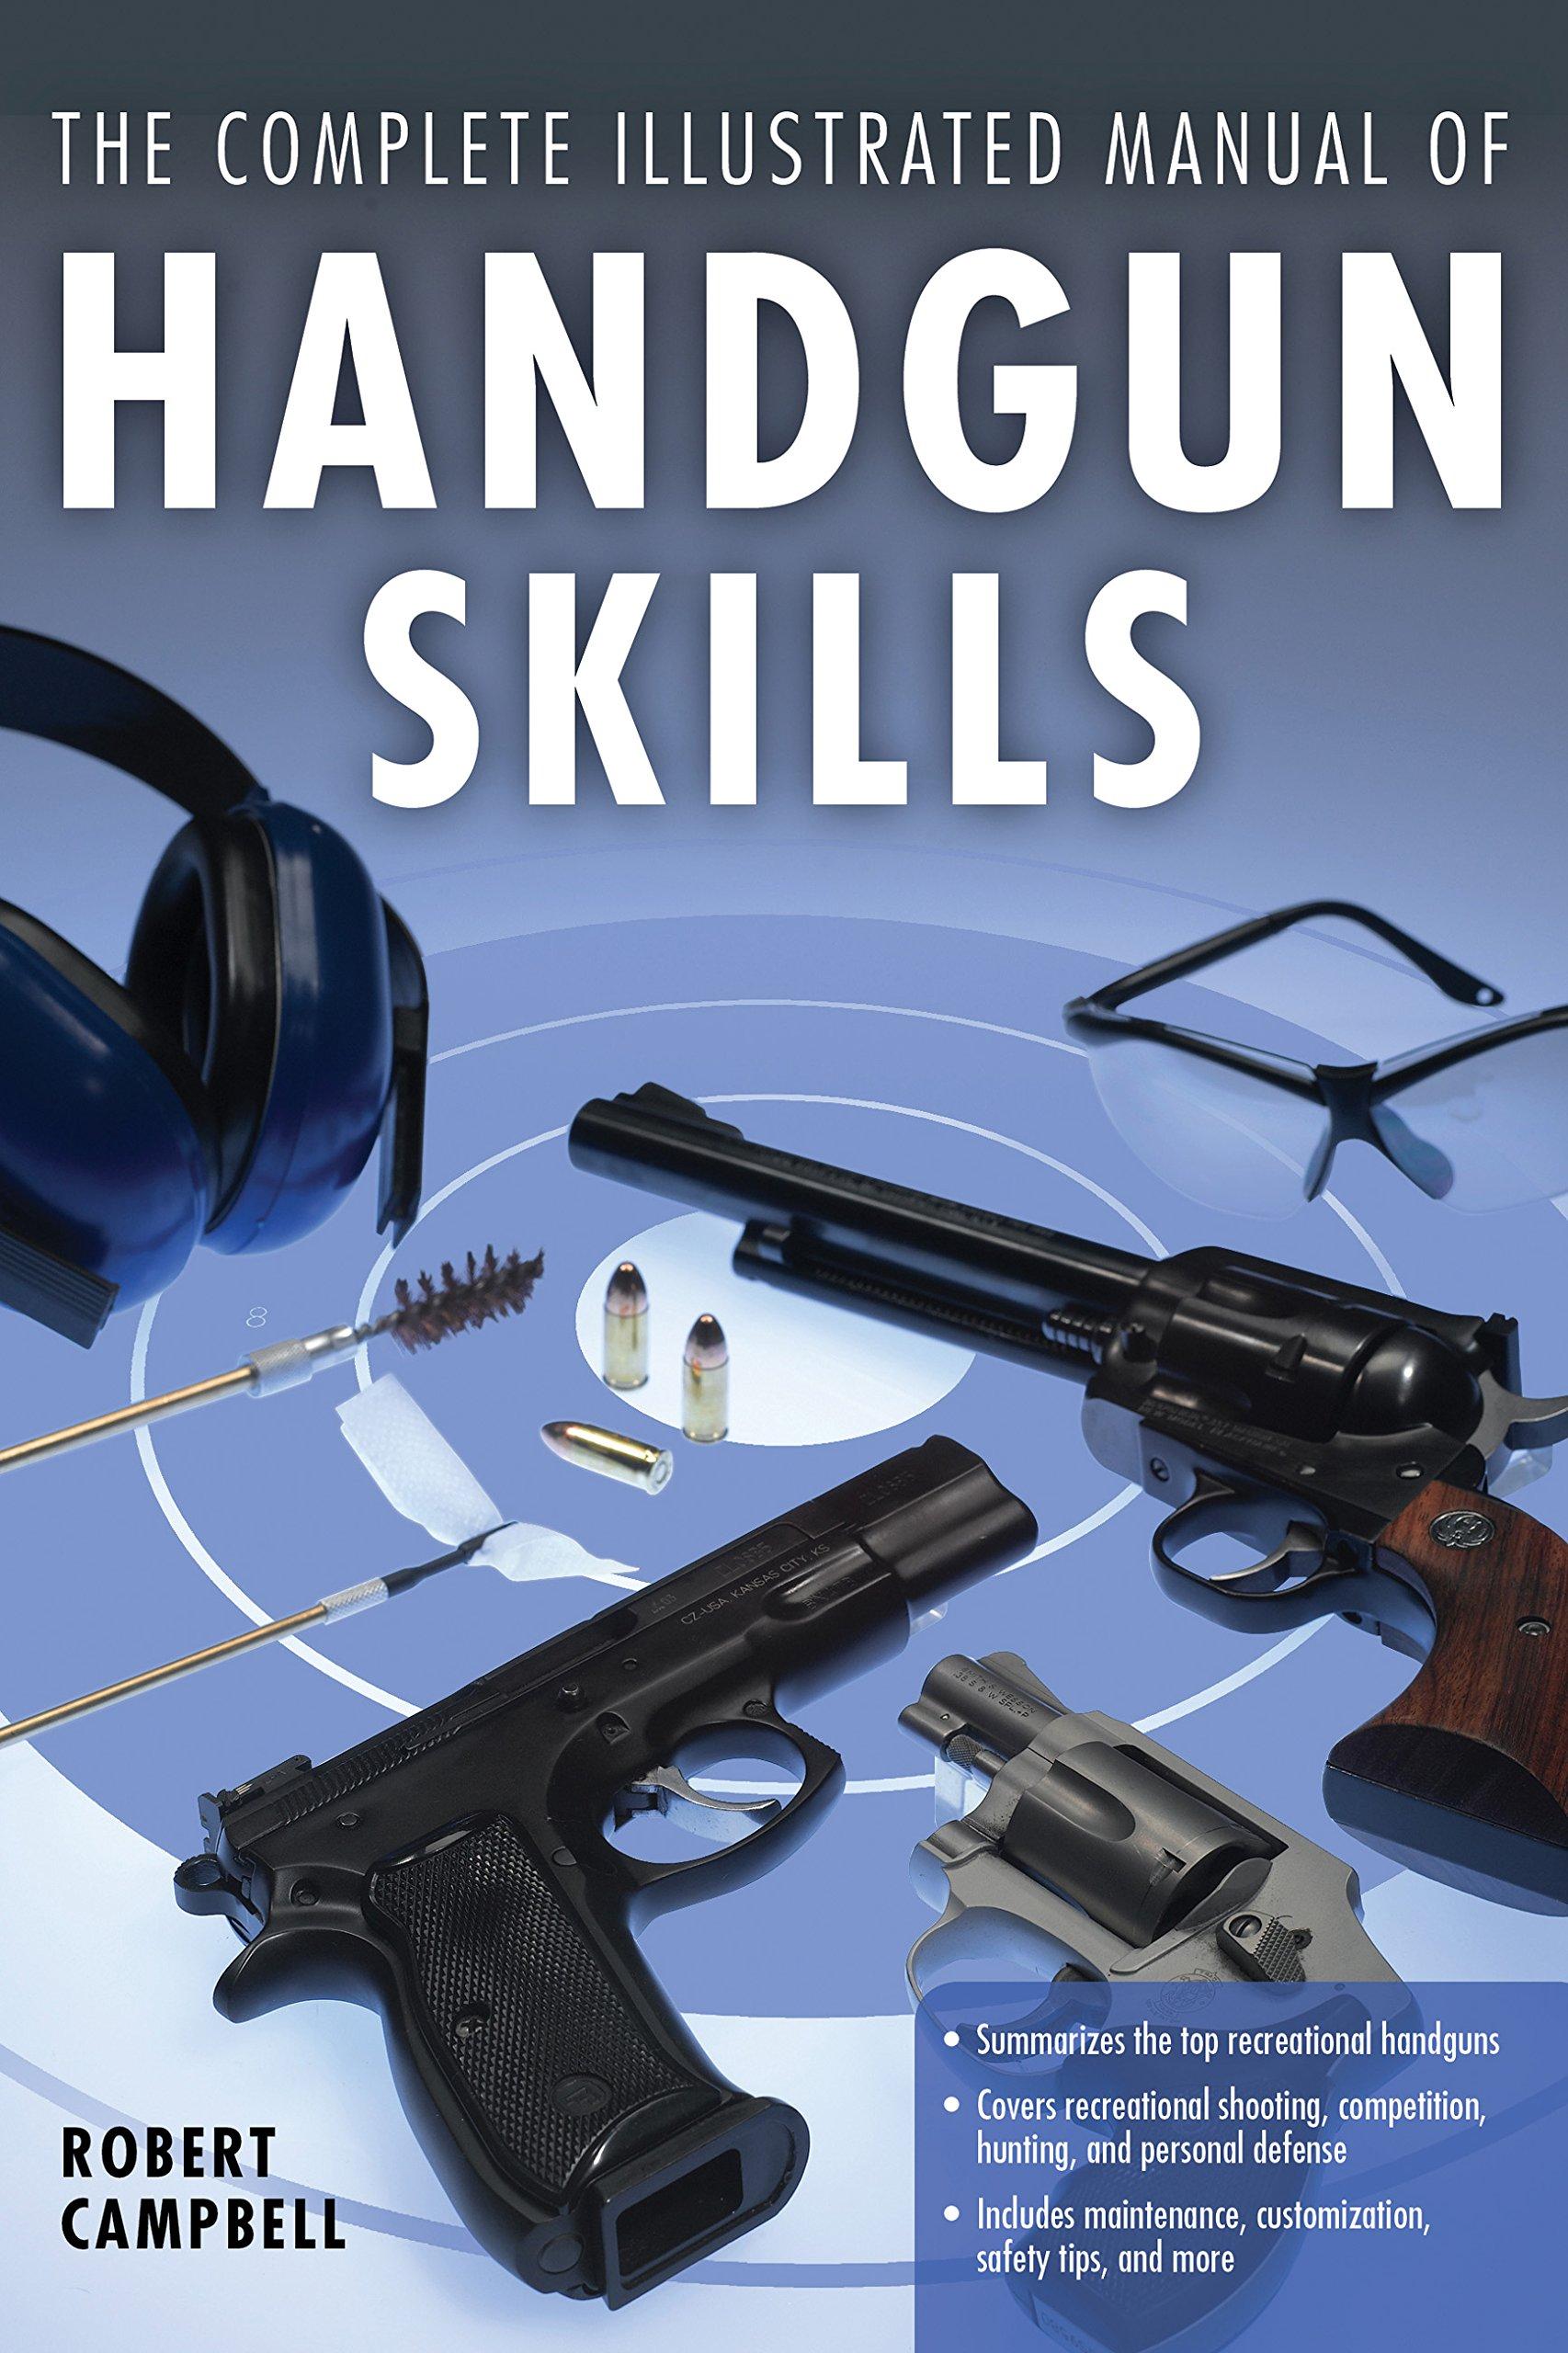 The Complete Illustrated Manual of Handgun Skills: Robert Campbell:  0752748341050: Amazon.com: Books